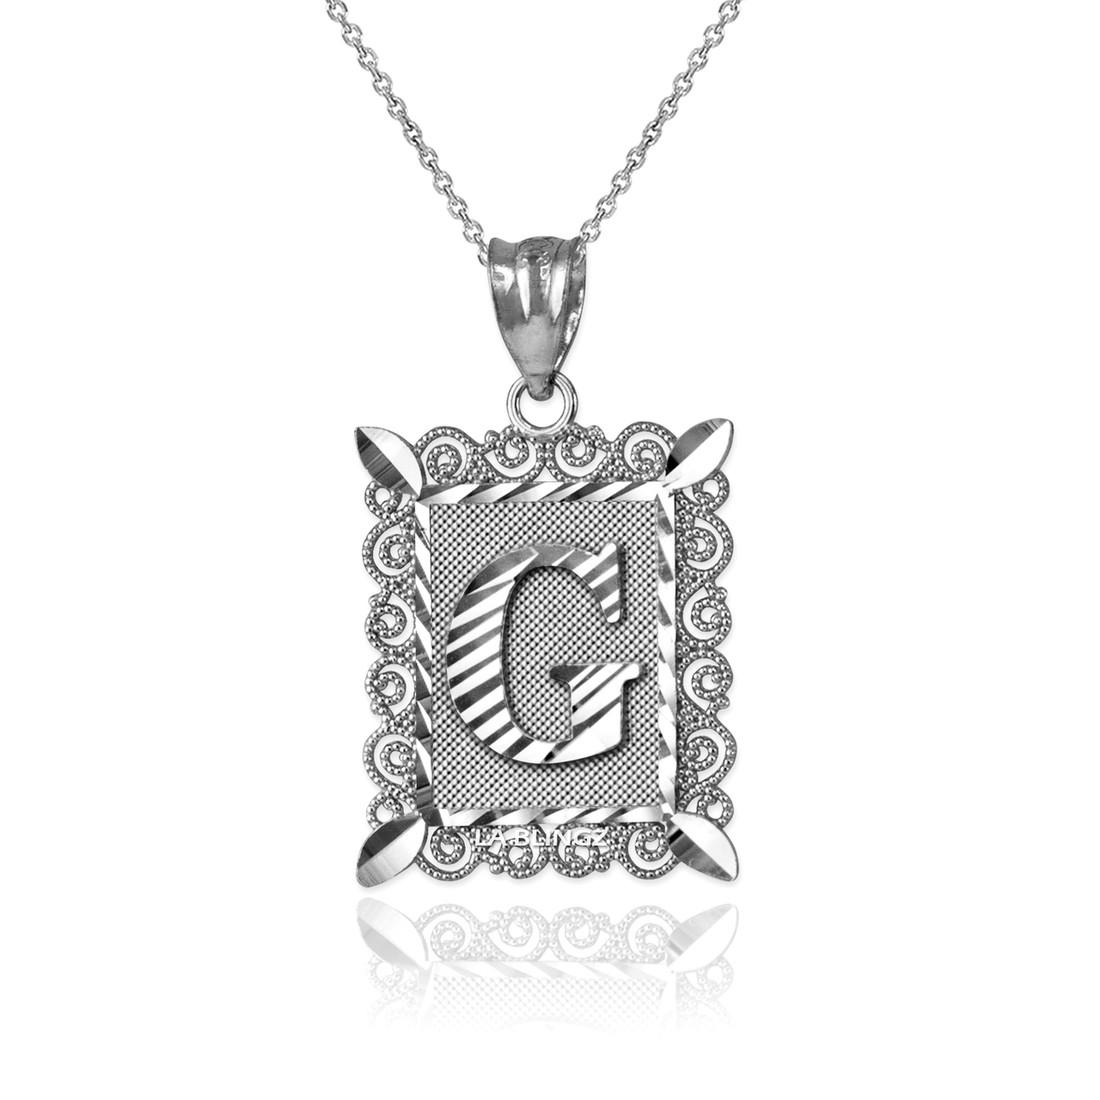 Jewar Mandi Bangles 2.6 Inches 2 Piece Two Gram Gold Plated Jewelry For Women /& Girls 7902